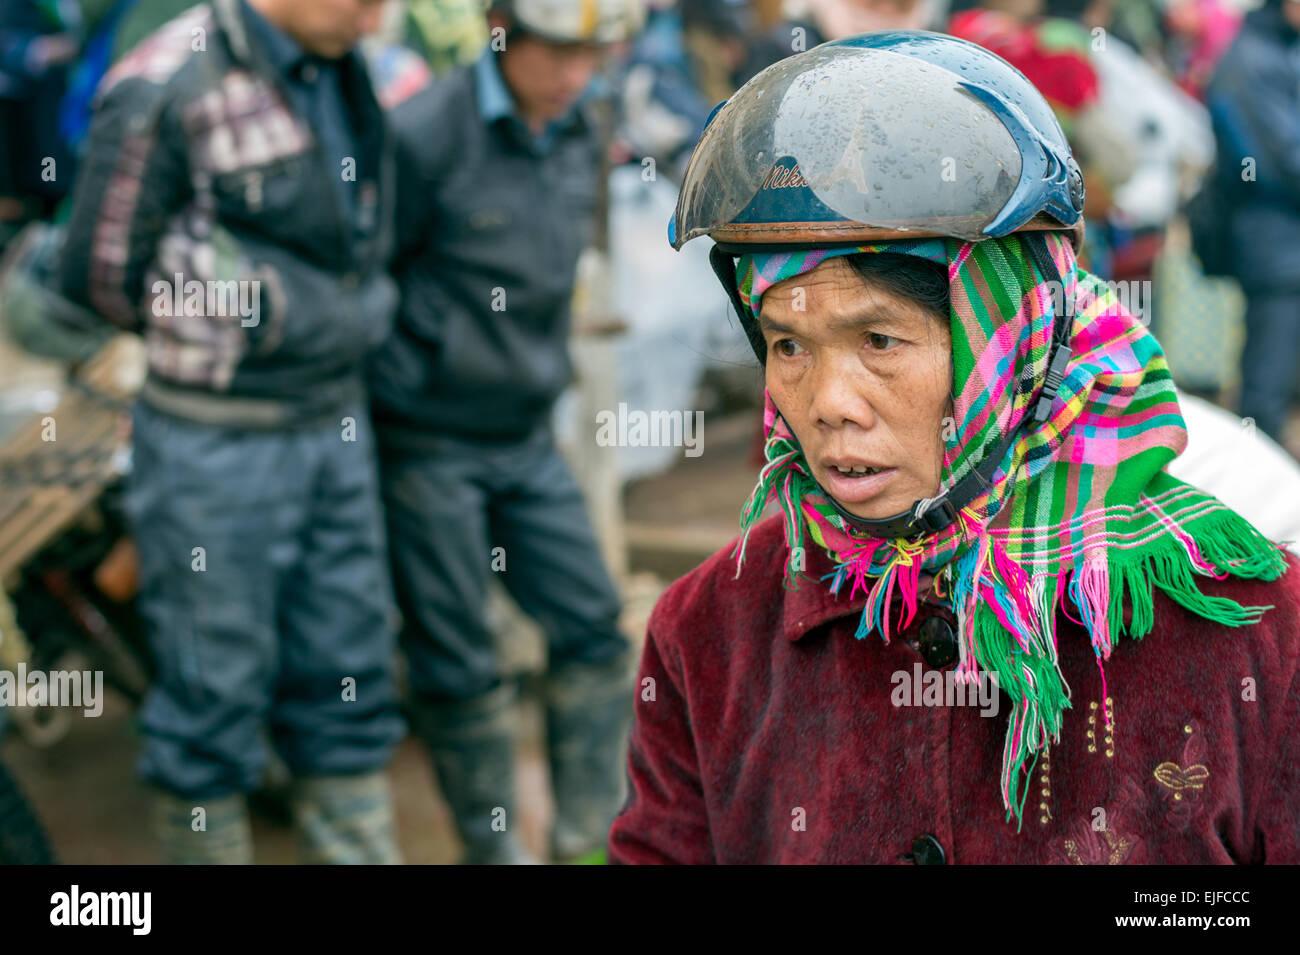 Hmong woman at a market in Sapa, Vietnam - Stock Image